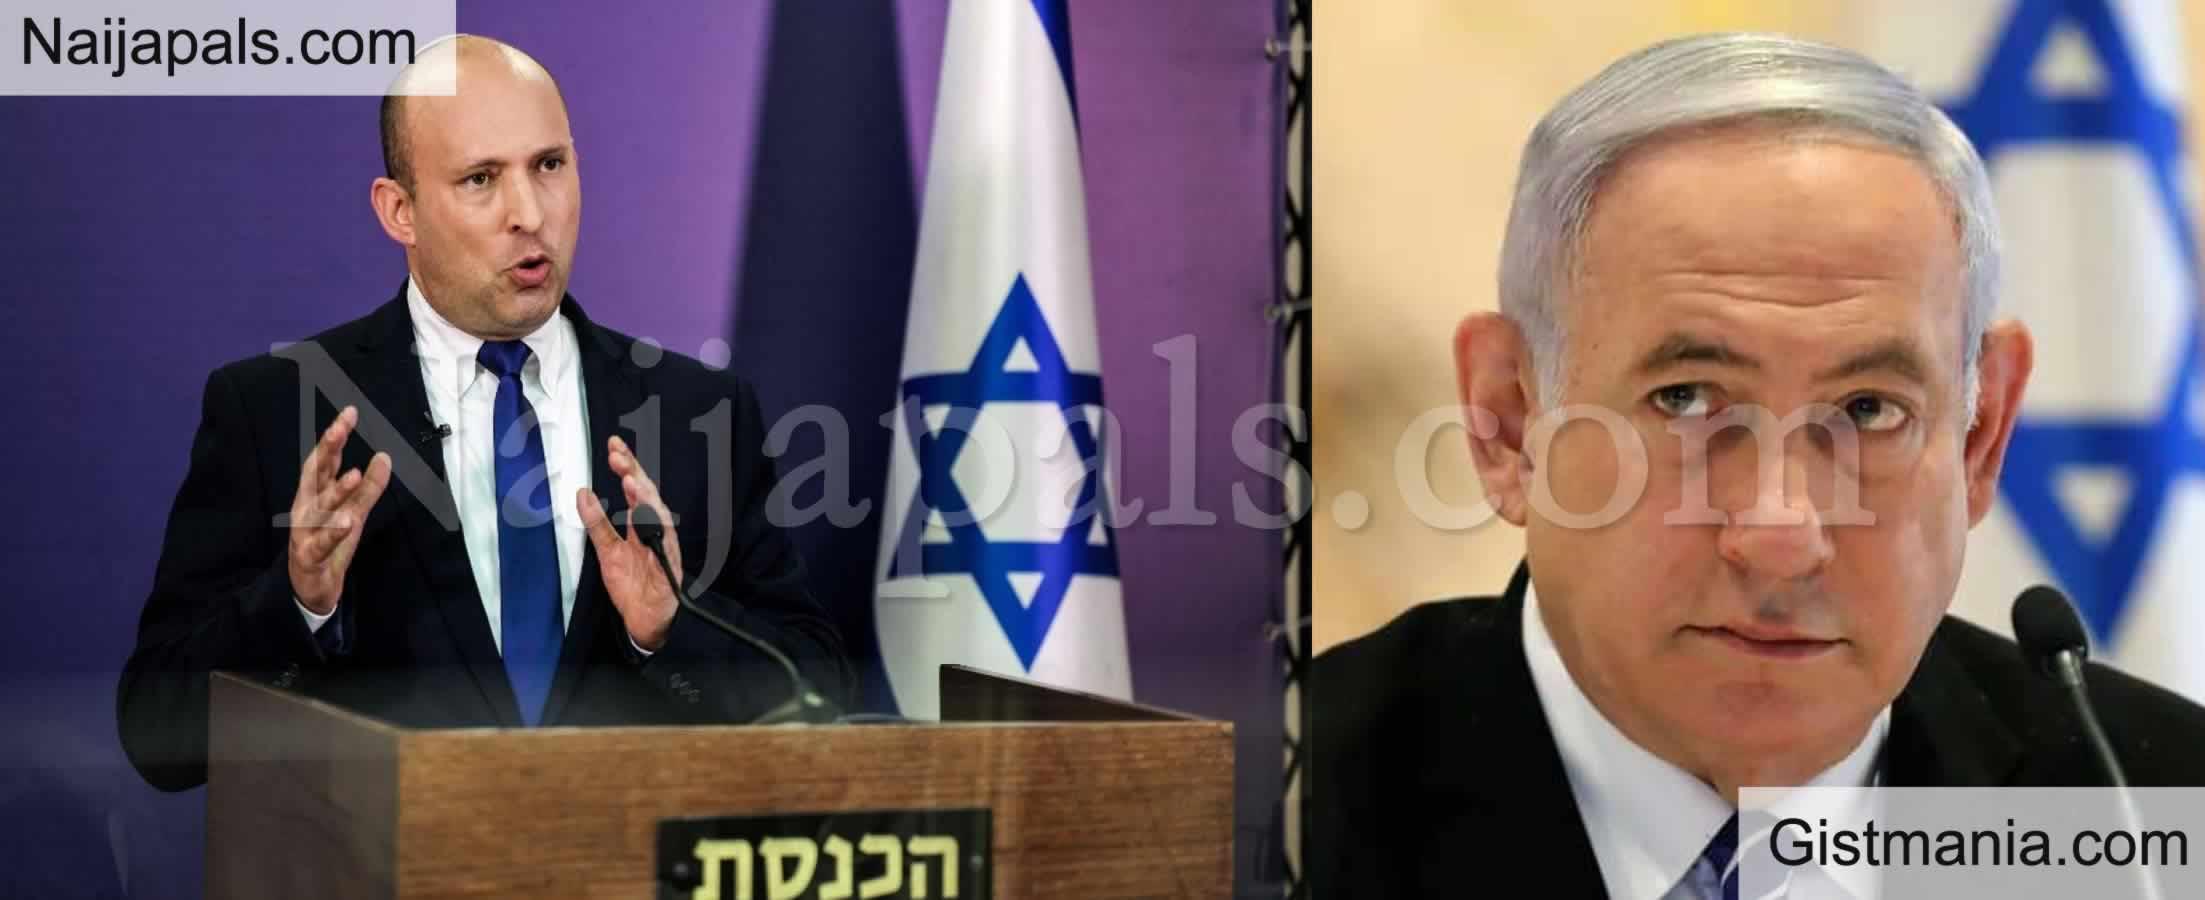 <img alt='.' class='lazyload' data-src='https://img.gistmania.com/emot/photo.png' /><img alt='.' class='lazyload' data-src='https://img.gistmania.com/emot/news.gif' /> <b>Naftali Bennett Ends Netanyahu's 12-Year Rule, Sworn In As Israel's New Prime Minister</b>